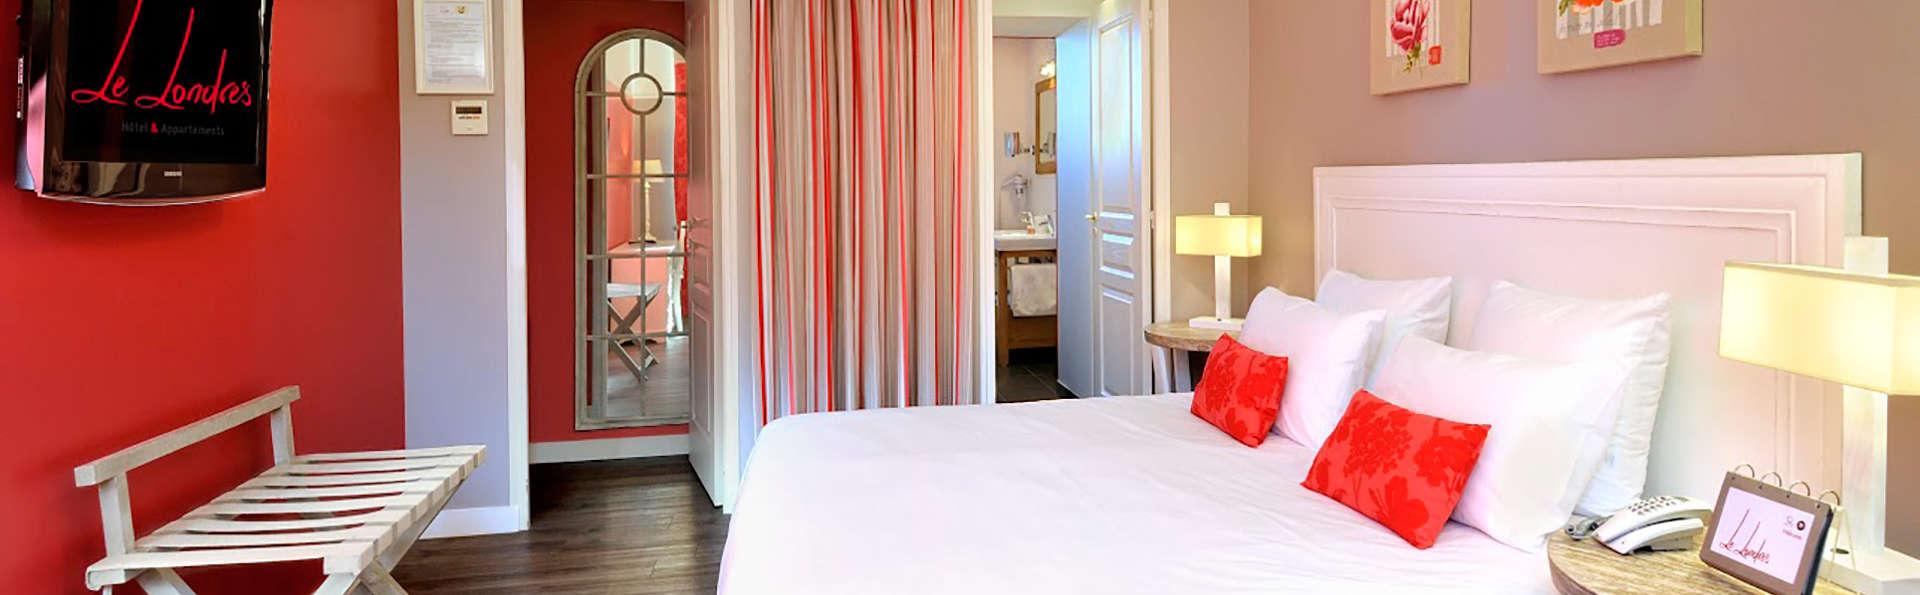 Hôtel de Londres - EDIT_room12.jpg